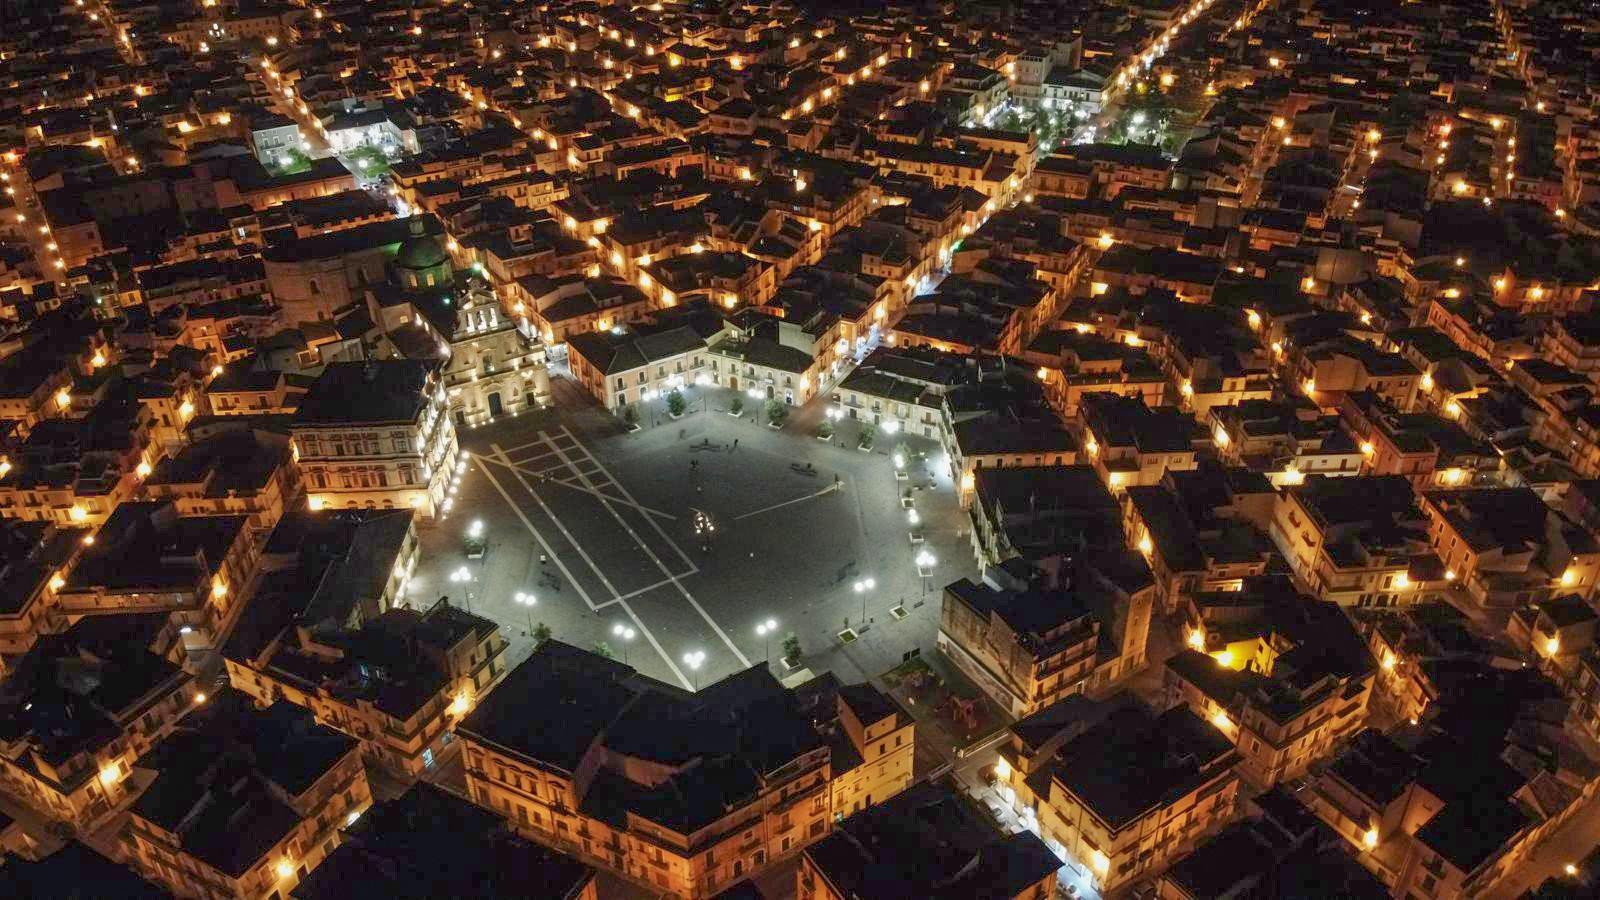 Grammichele - aerea notturna - foto Astuto